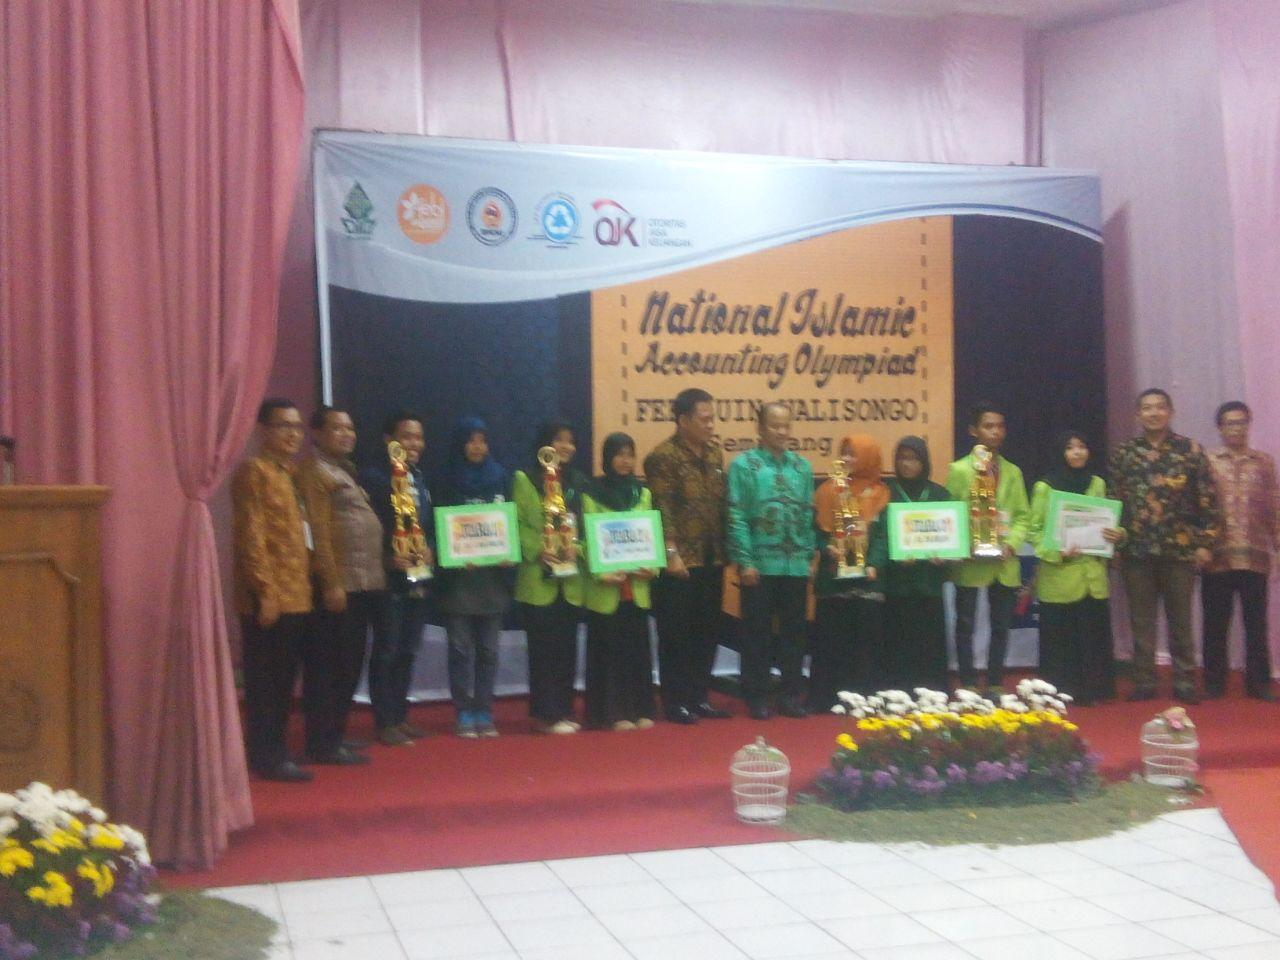 National Islamic Accounting Olympiad 2016